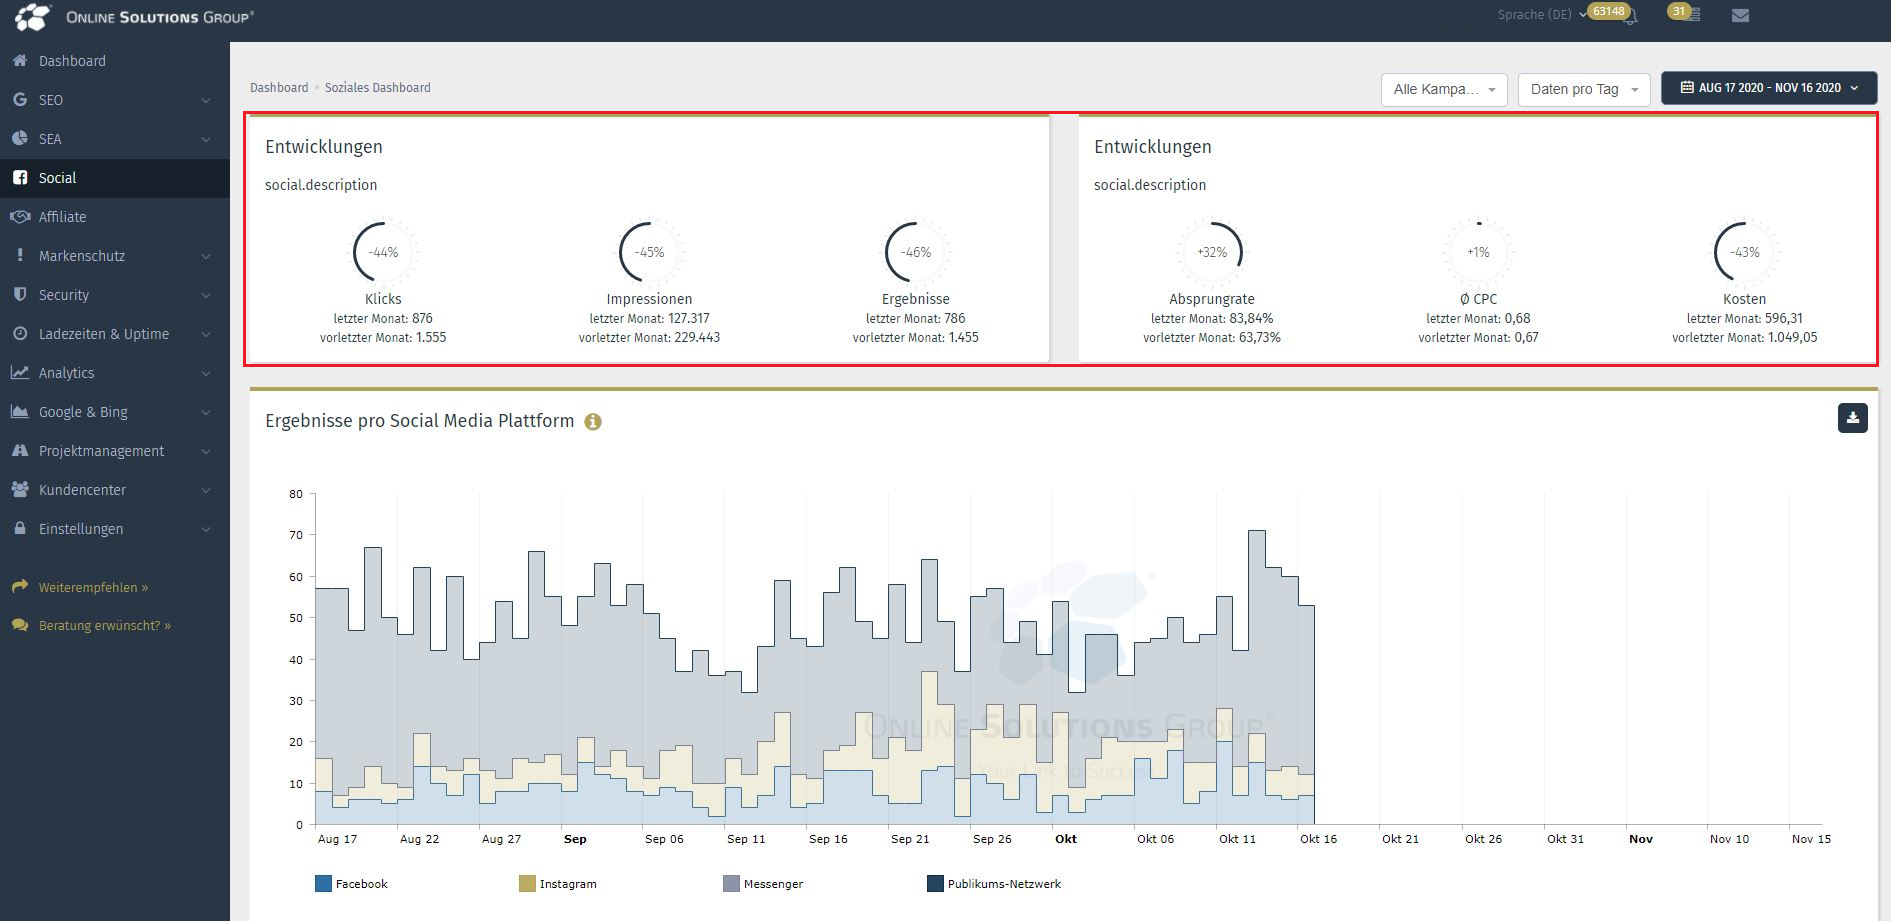 Performance Suite: Social Media Tool - Entwicklungen